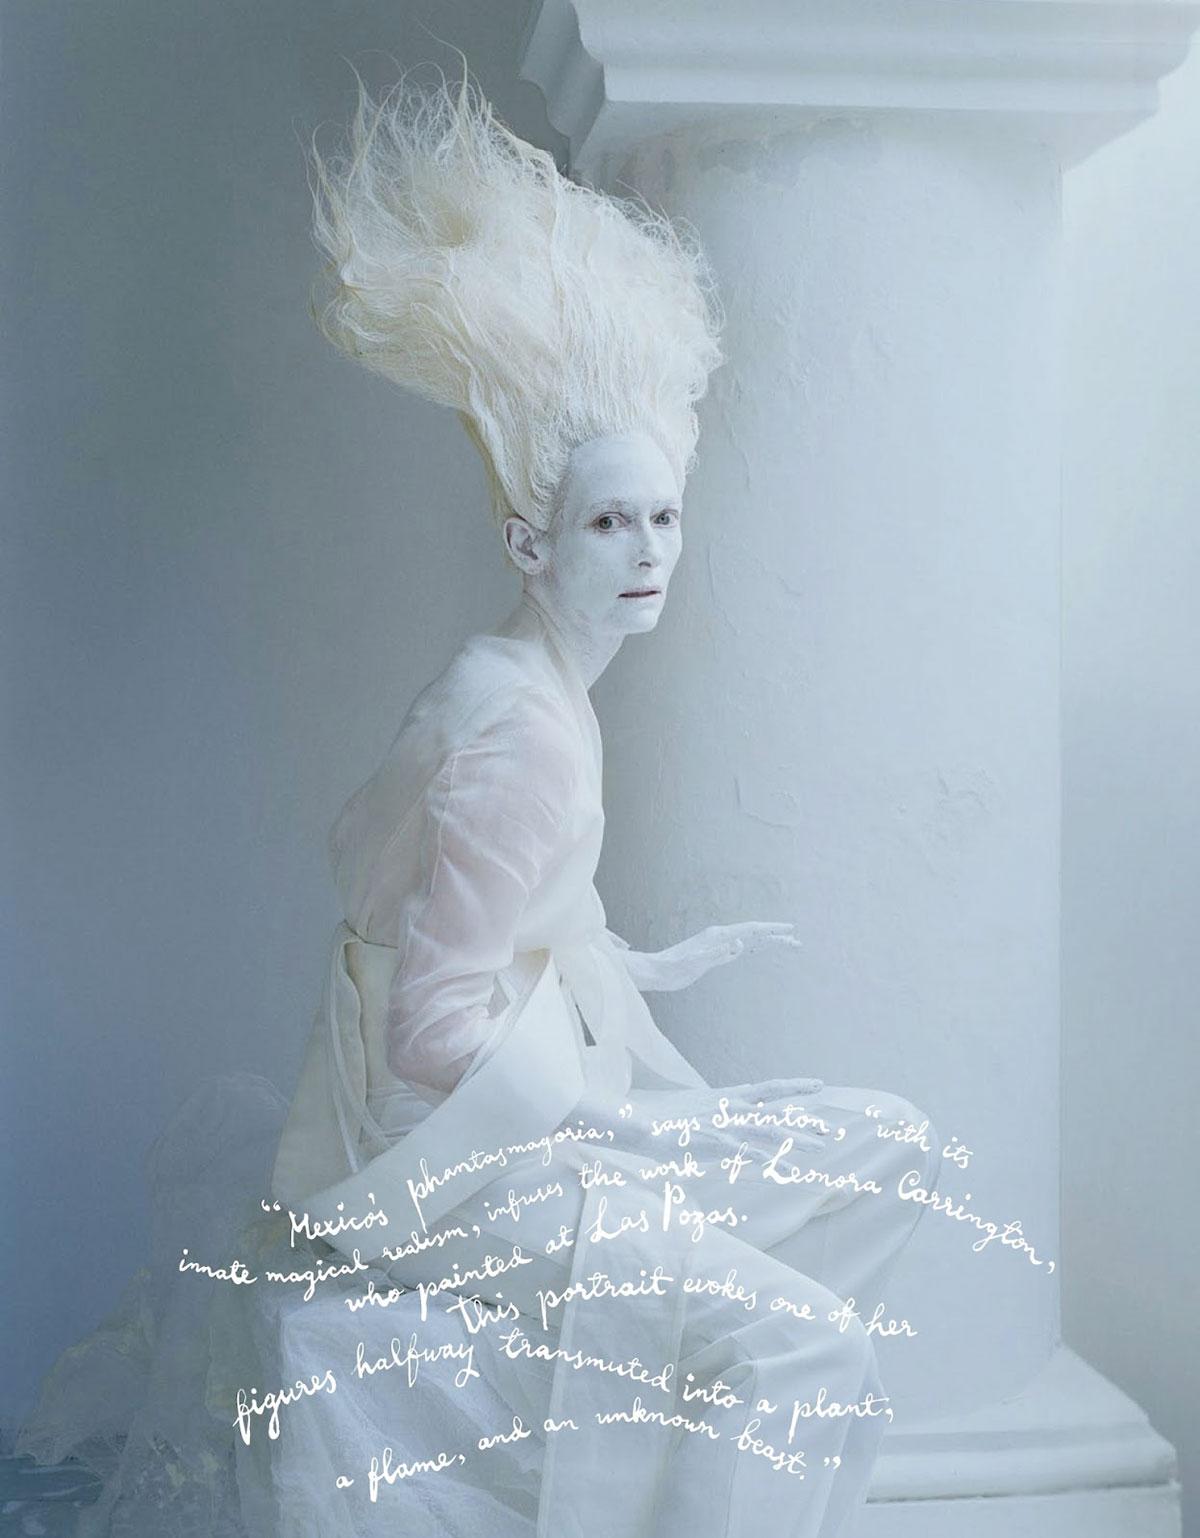 'Stranger Than Paradise' editorial. Tilda Swinton and Tim Walker for W Magazine   Yellowtrace.